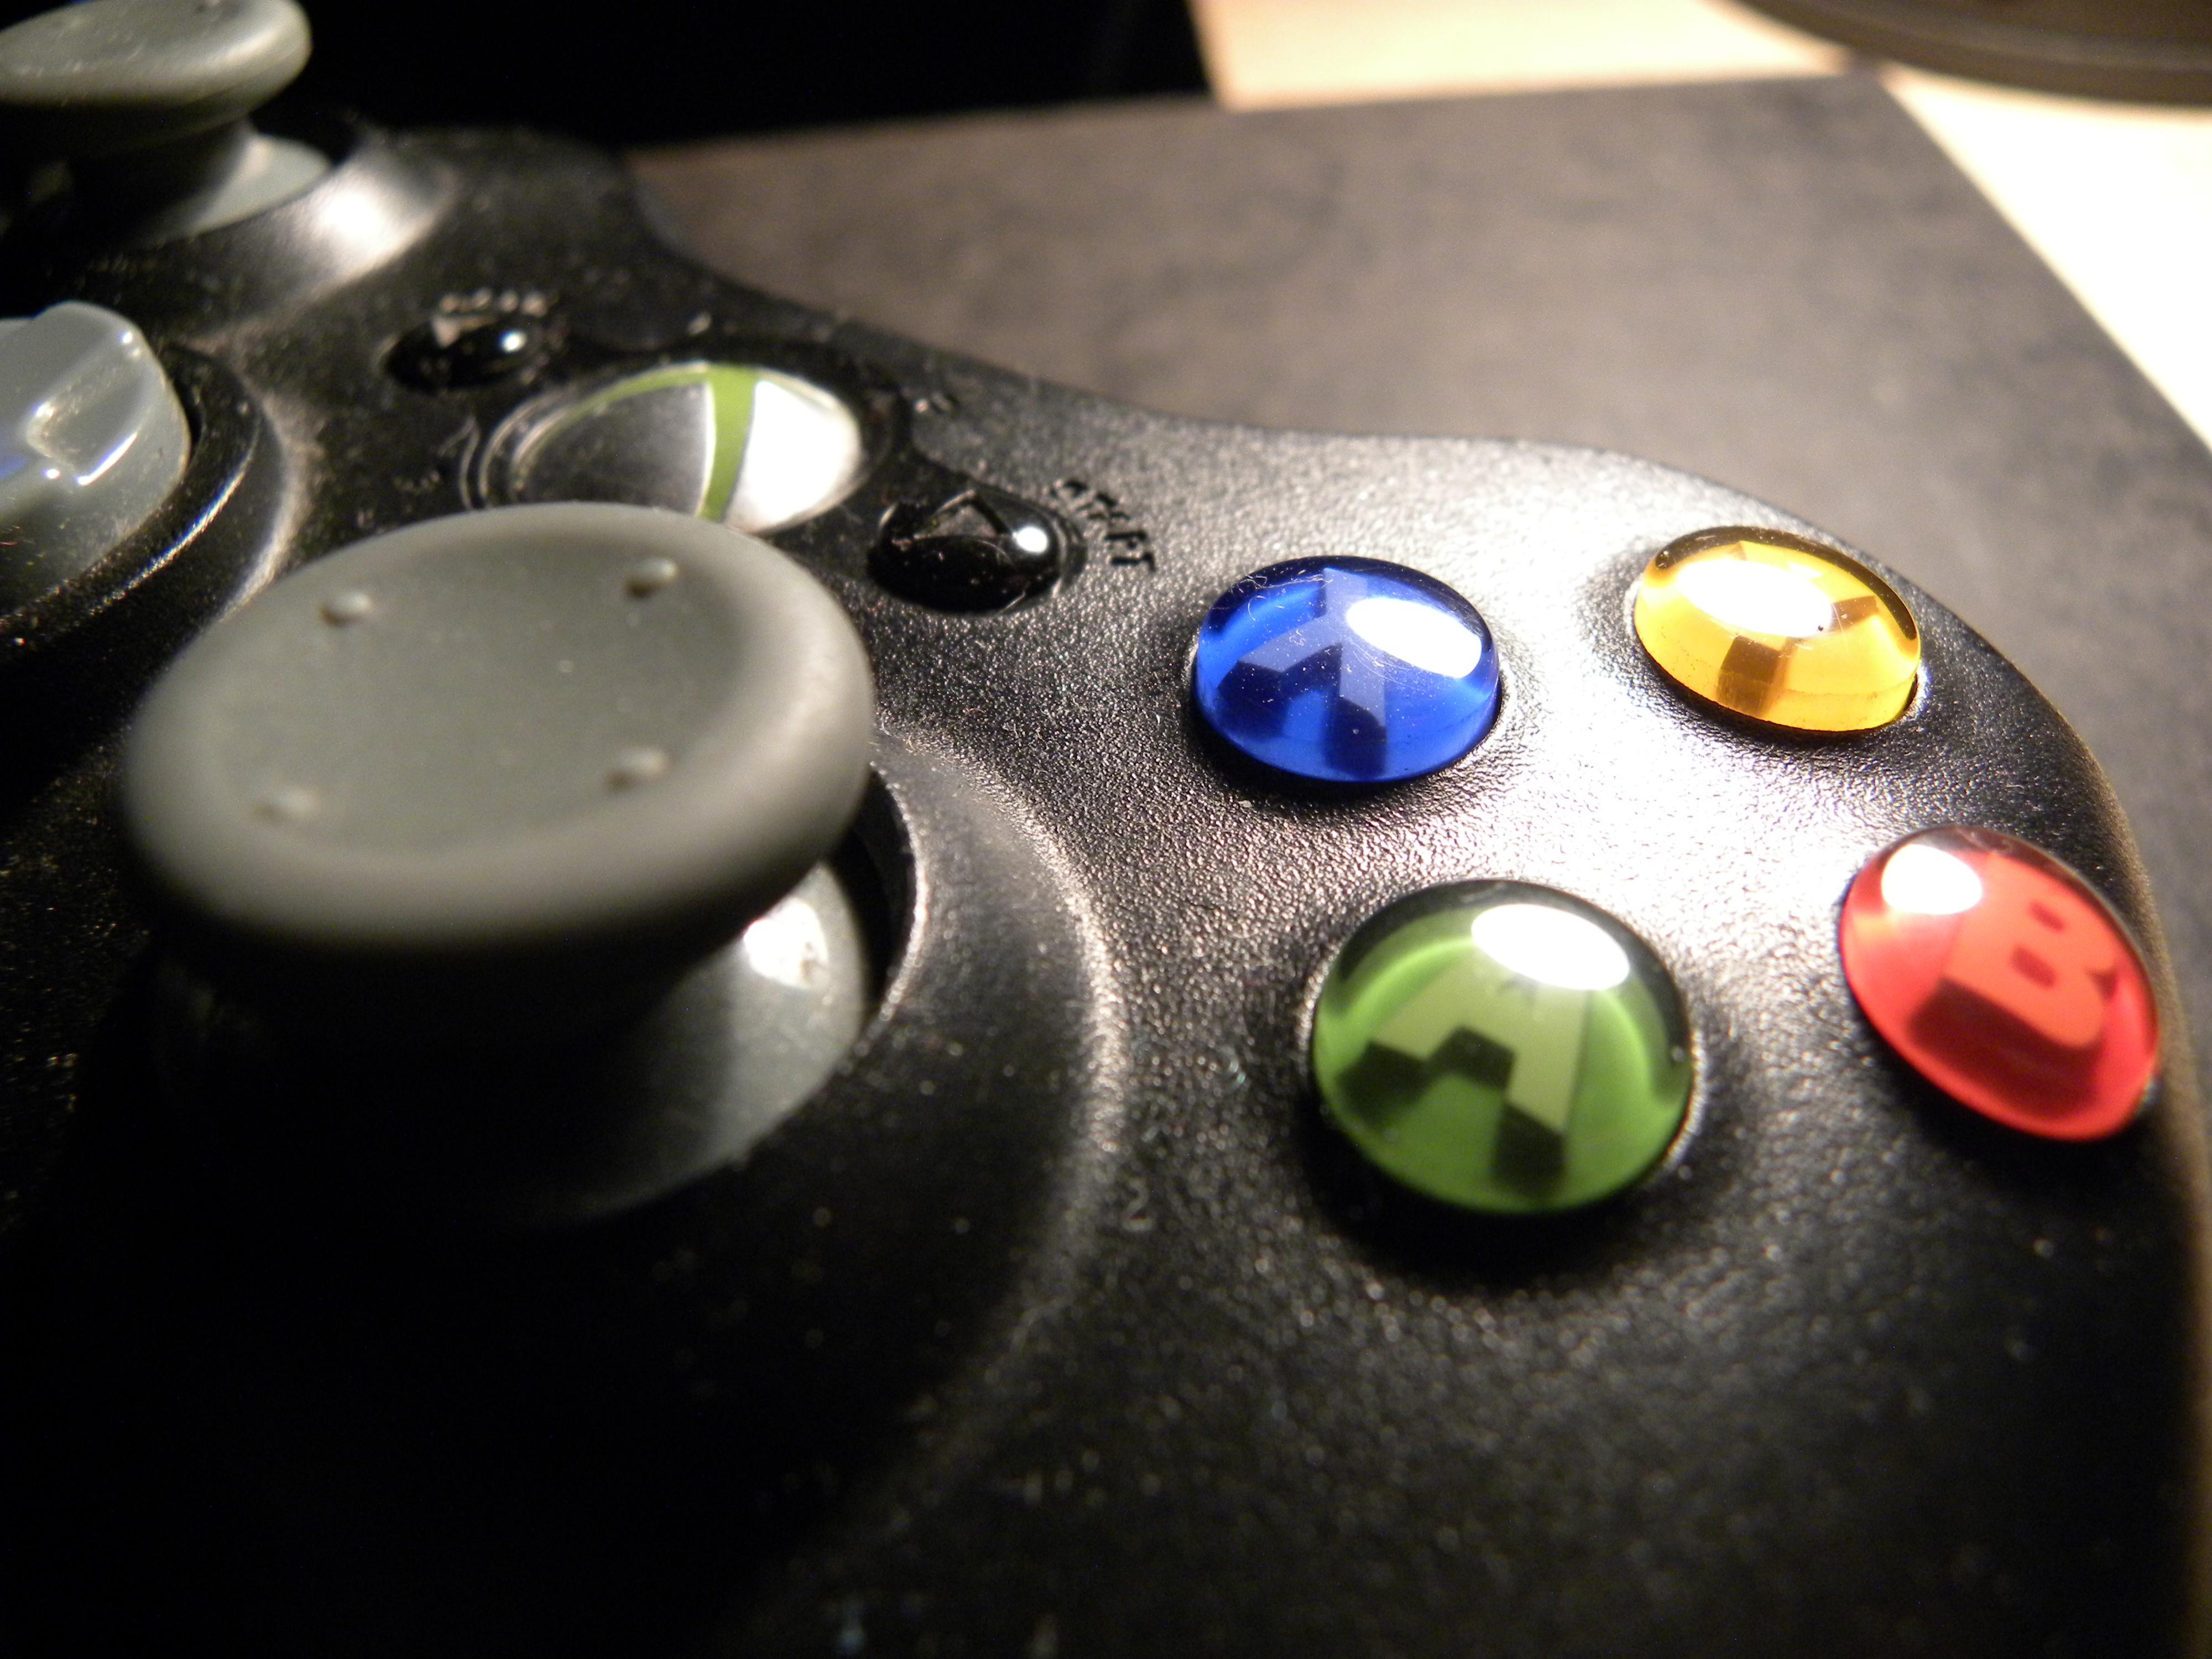 Xbox Controller Wallpaper - WallpaperSafari Xbox One Titanfall Controller